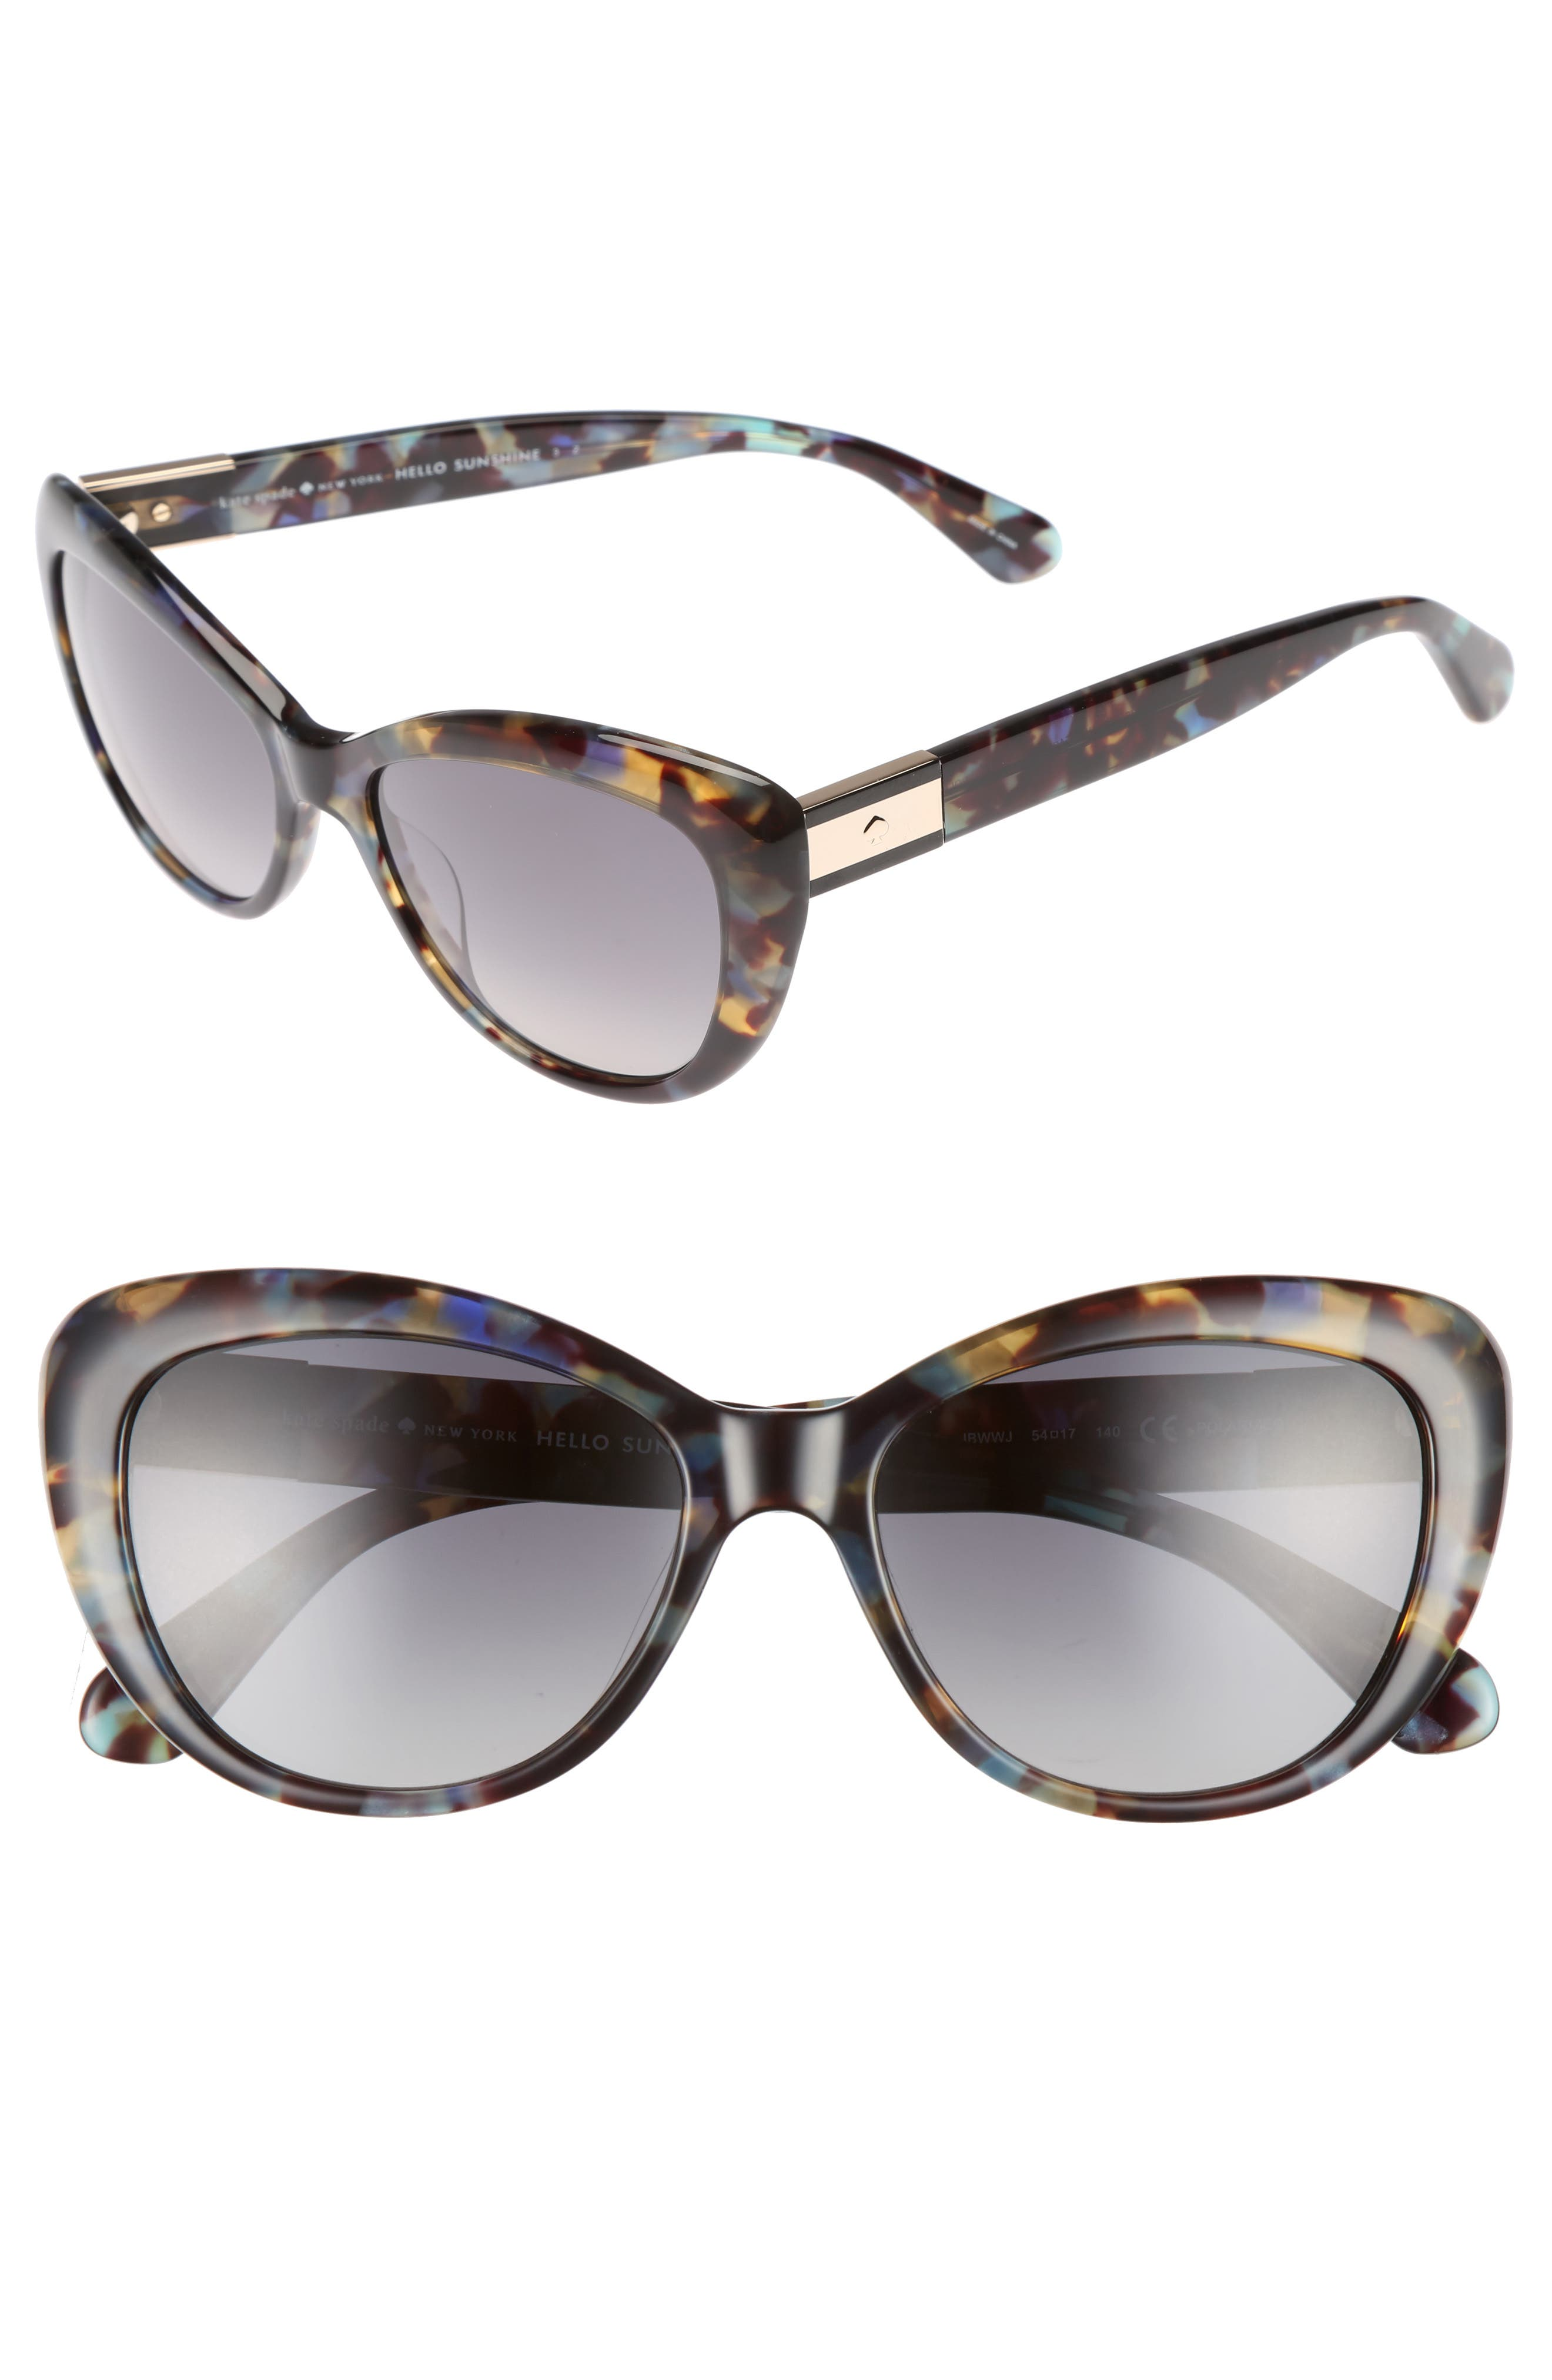 Main Image - kate spade new york emmalyn 54mm polarized cat eye sunglasses